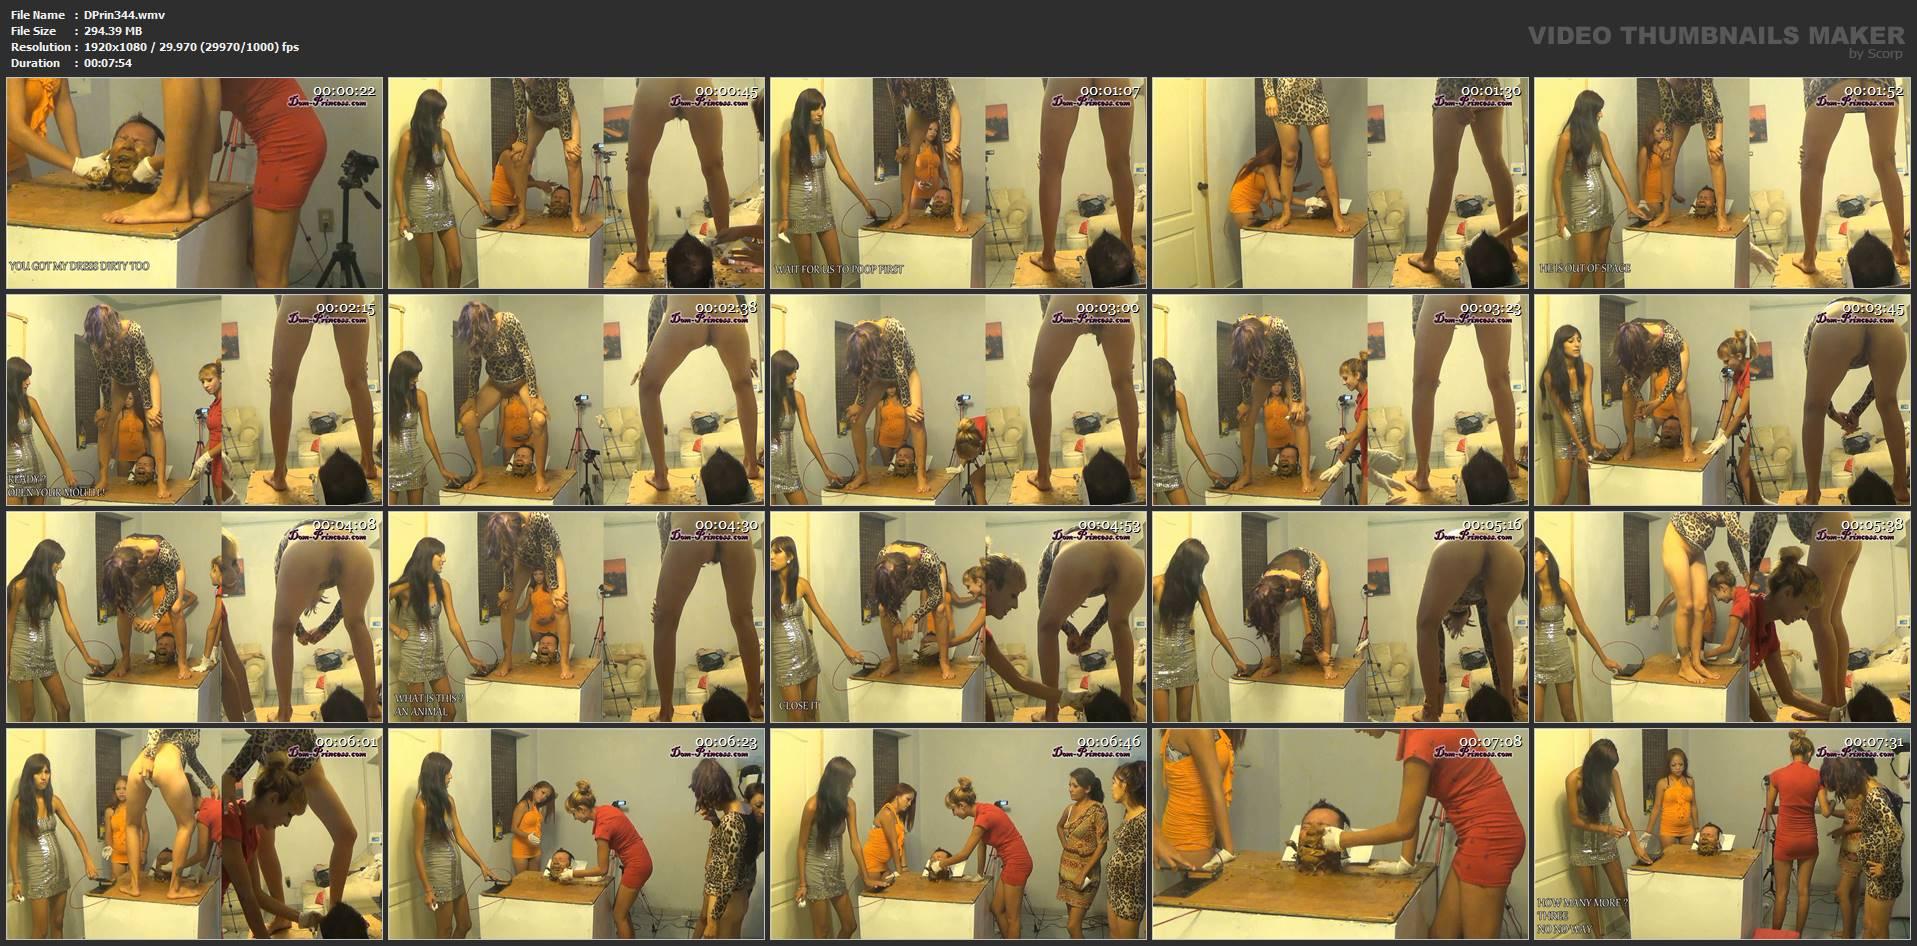 [DOM-PRINCESS] The Washing Machine Part 3 Christine [FULL HD][1080p][WMV]